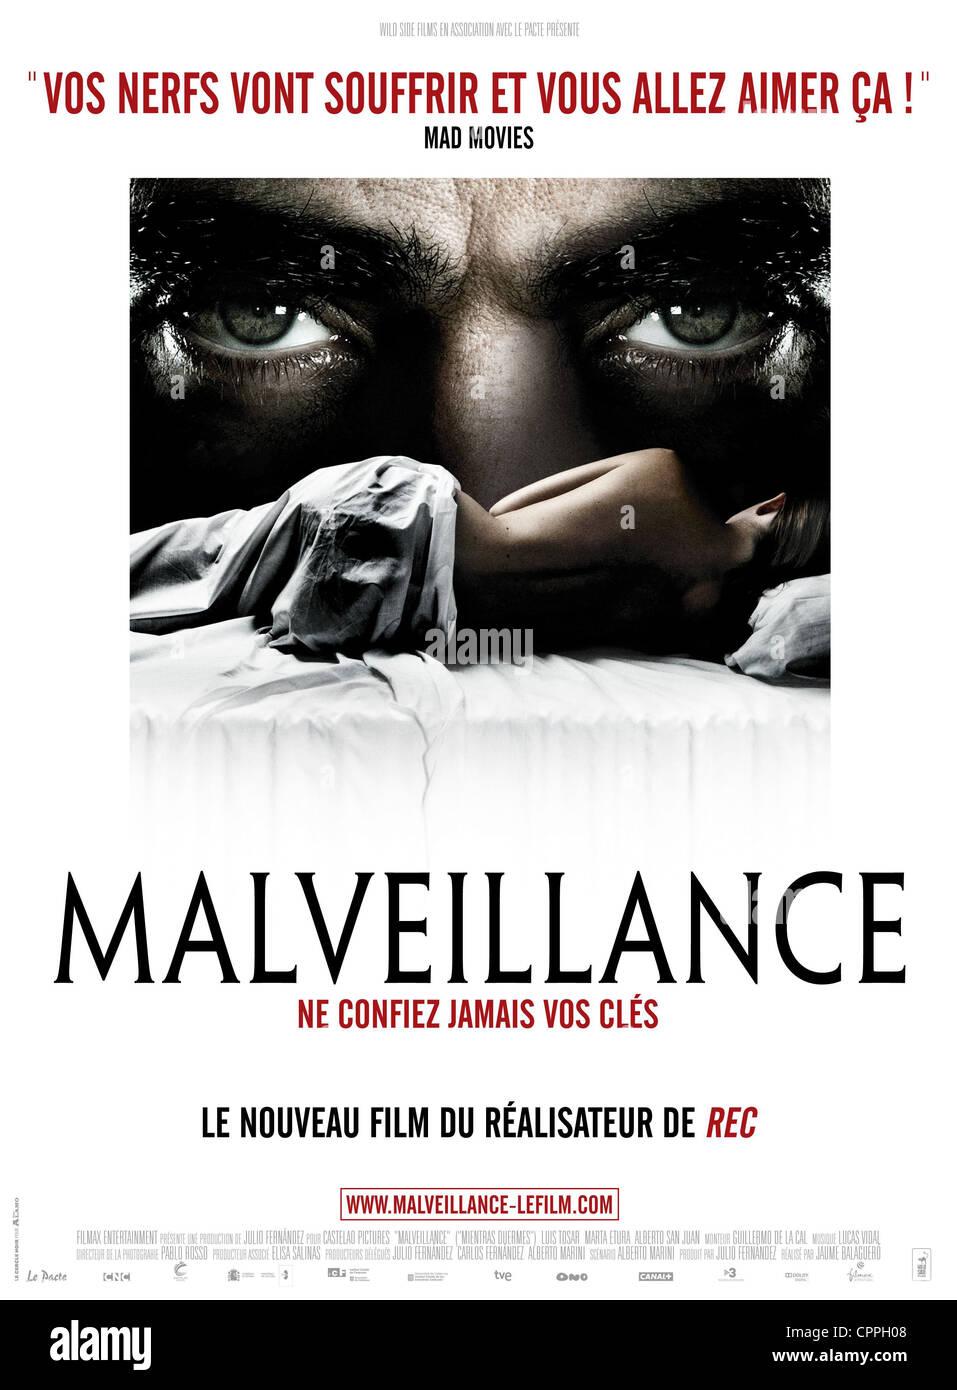 malveillance film